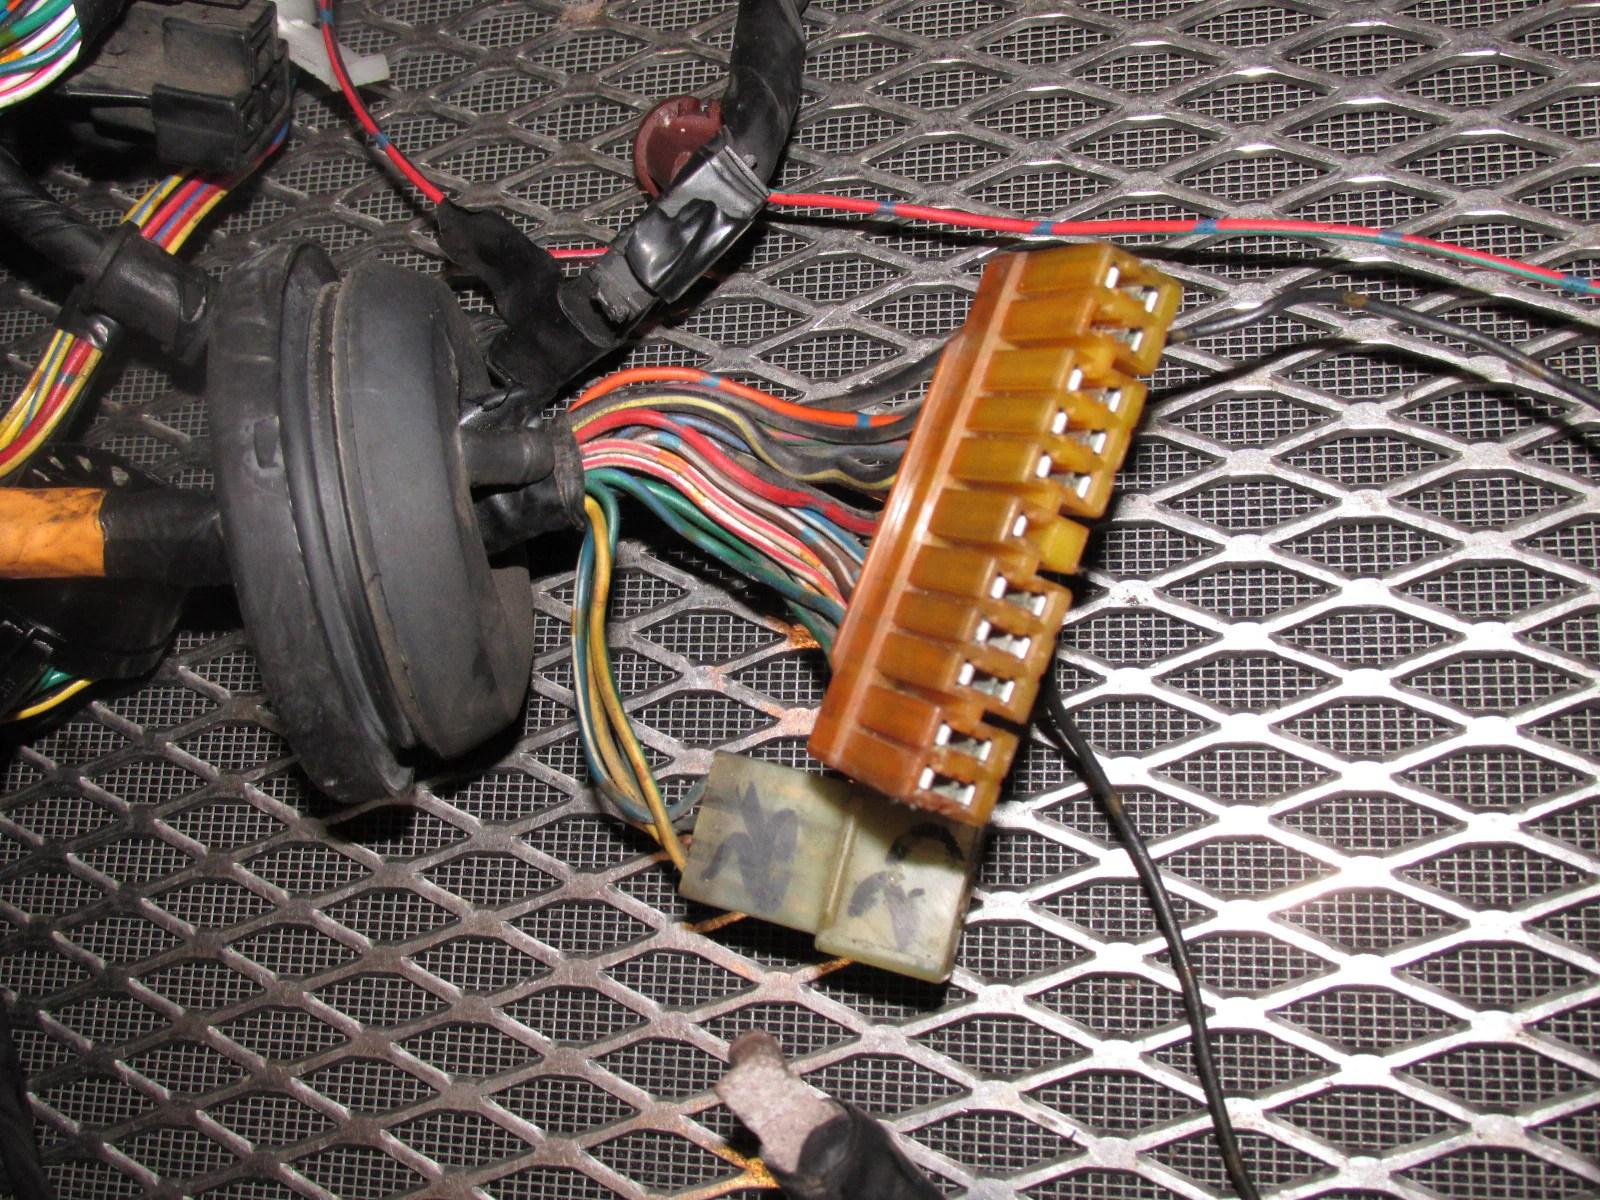 84 85 mazda rx7 oem engine computer headlight wiring harness [ 1600 x 1200 Pixel ]